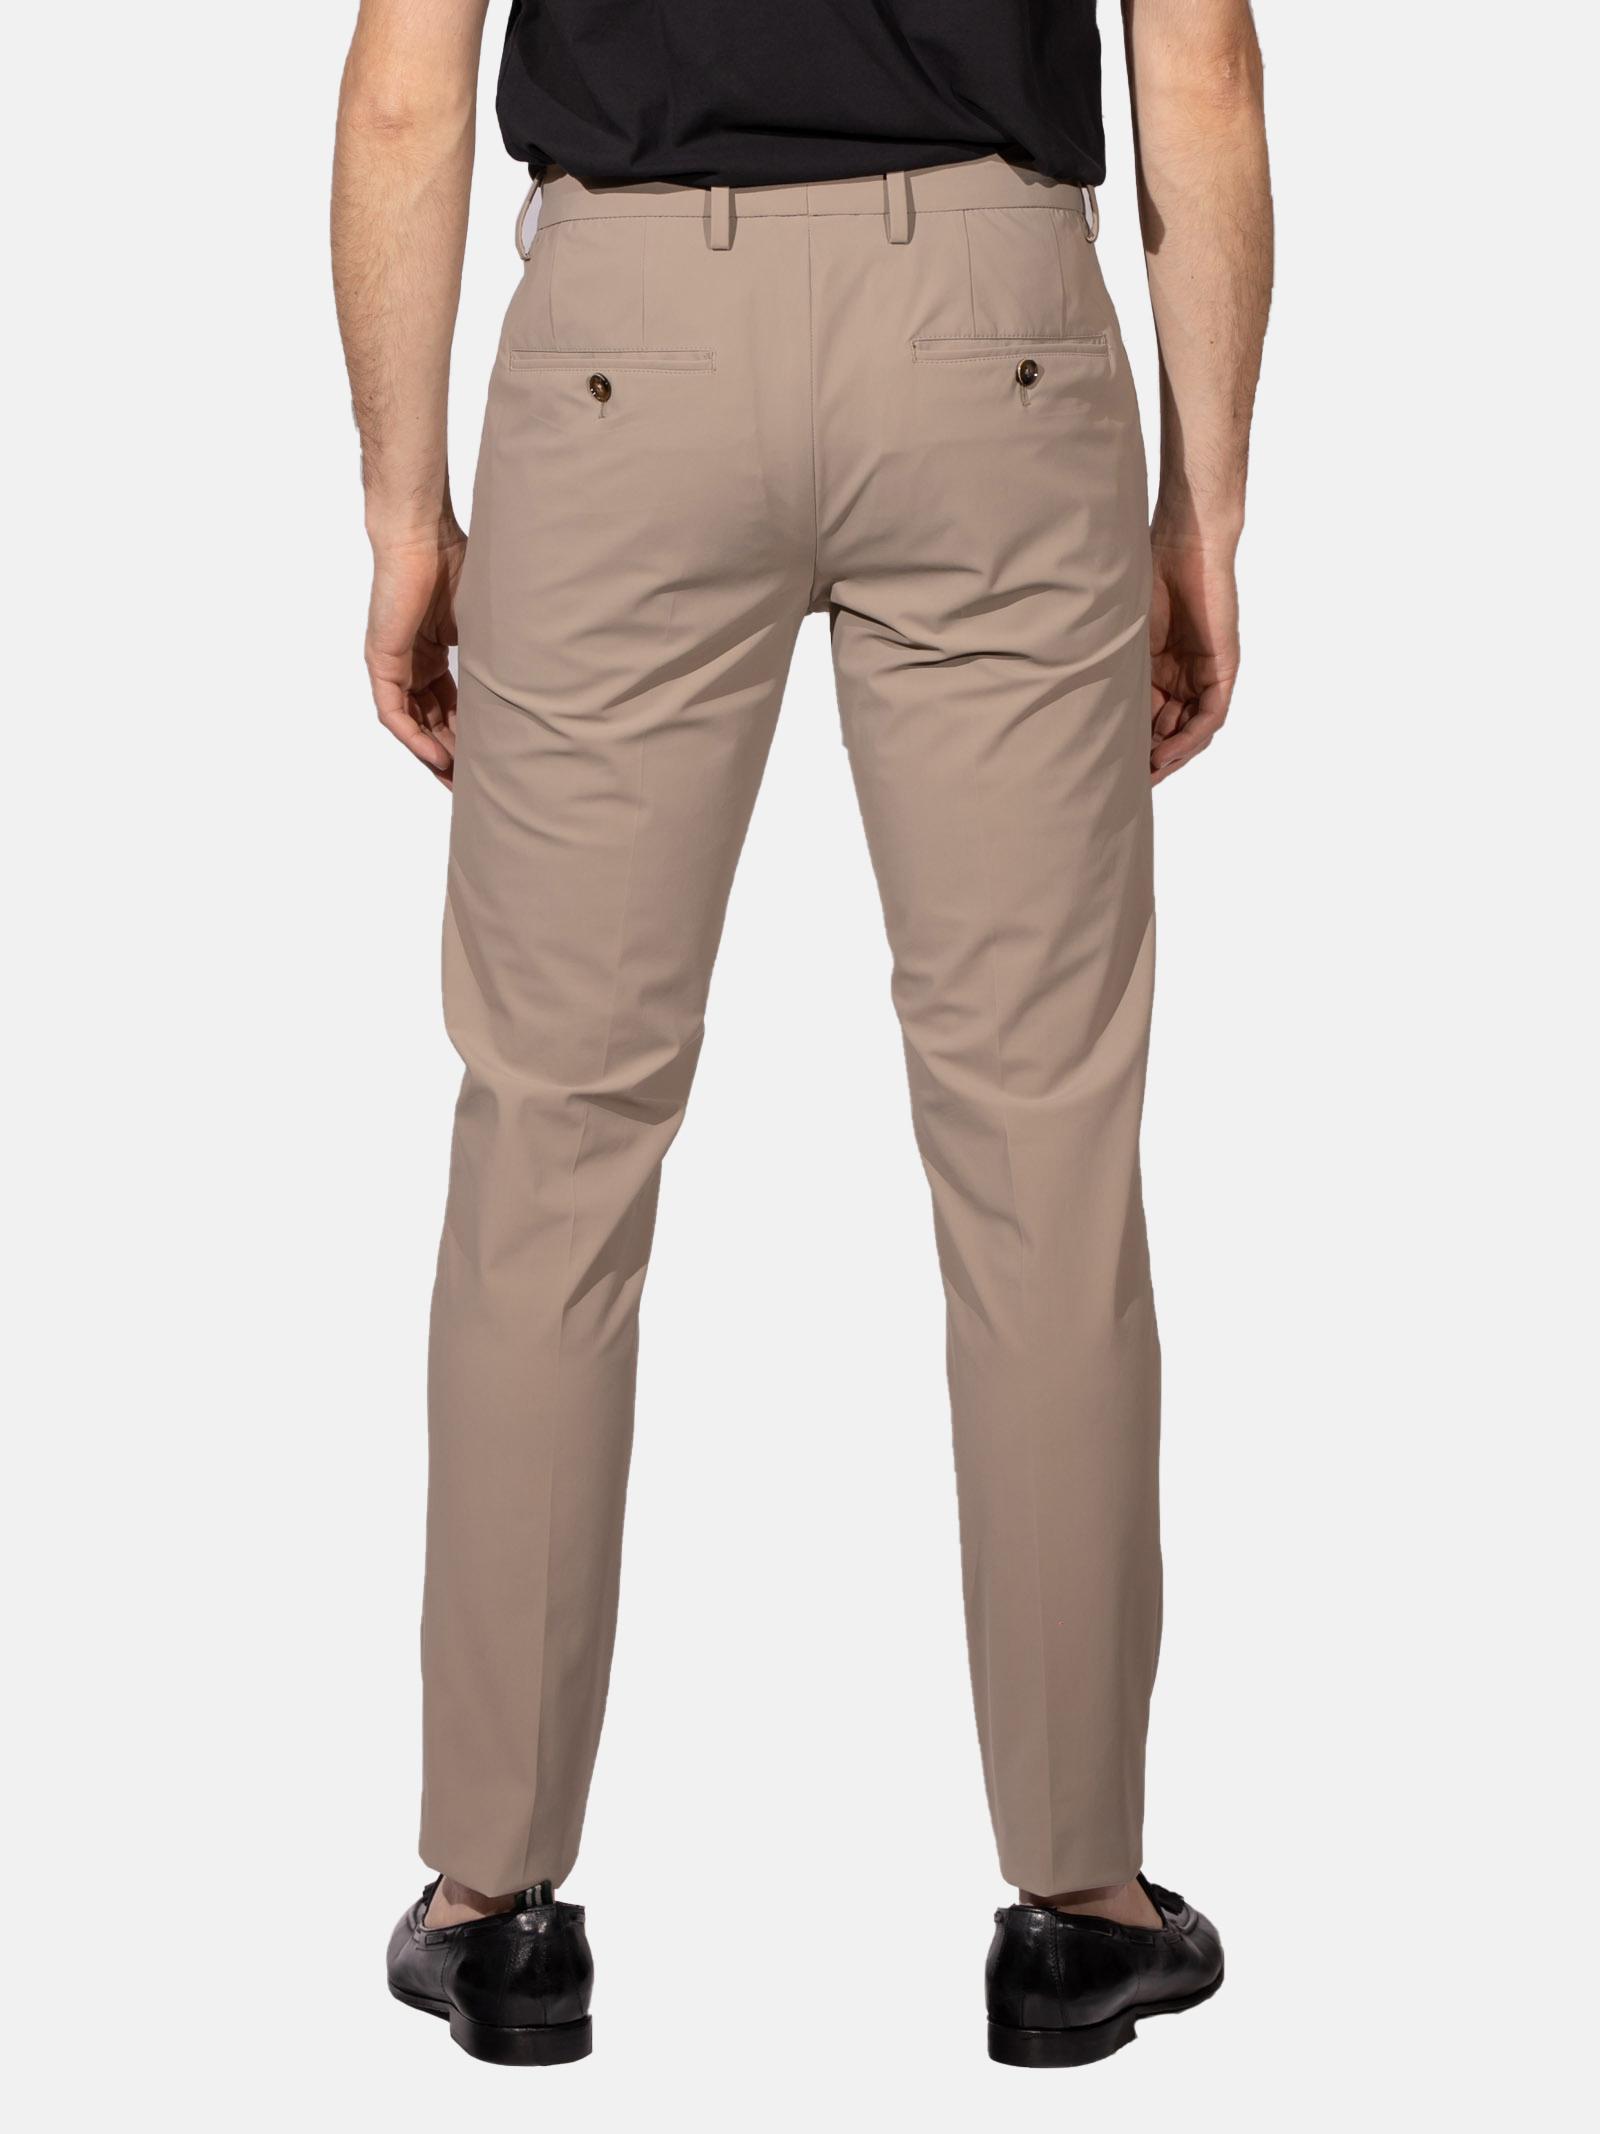 pantalone nikko tecnico G.T.A. | Pantalone | NIKKO TECNICO400